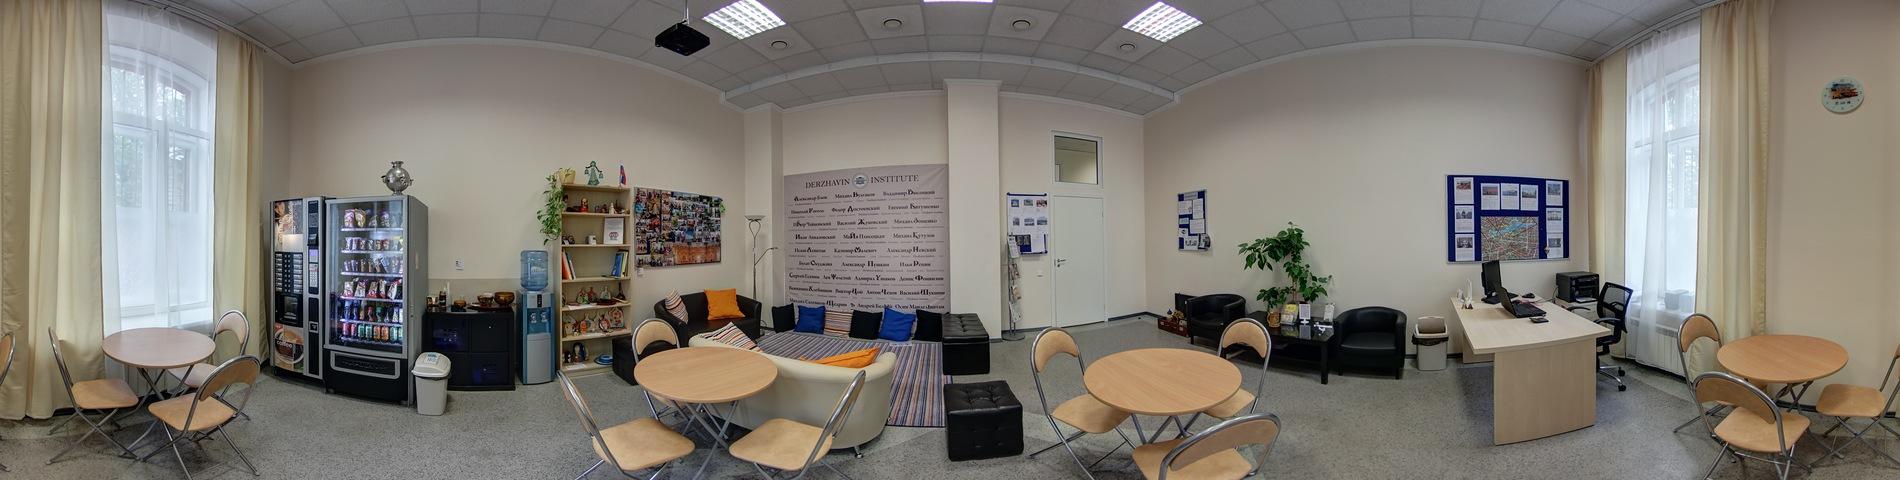 Derzhavin Institute obrazek 1